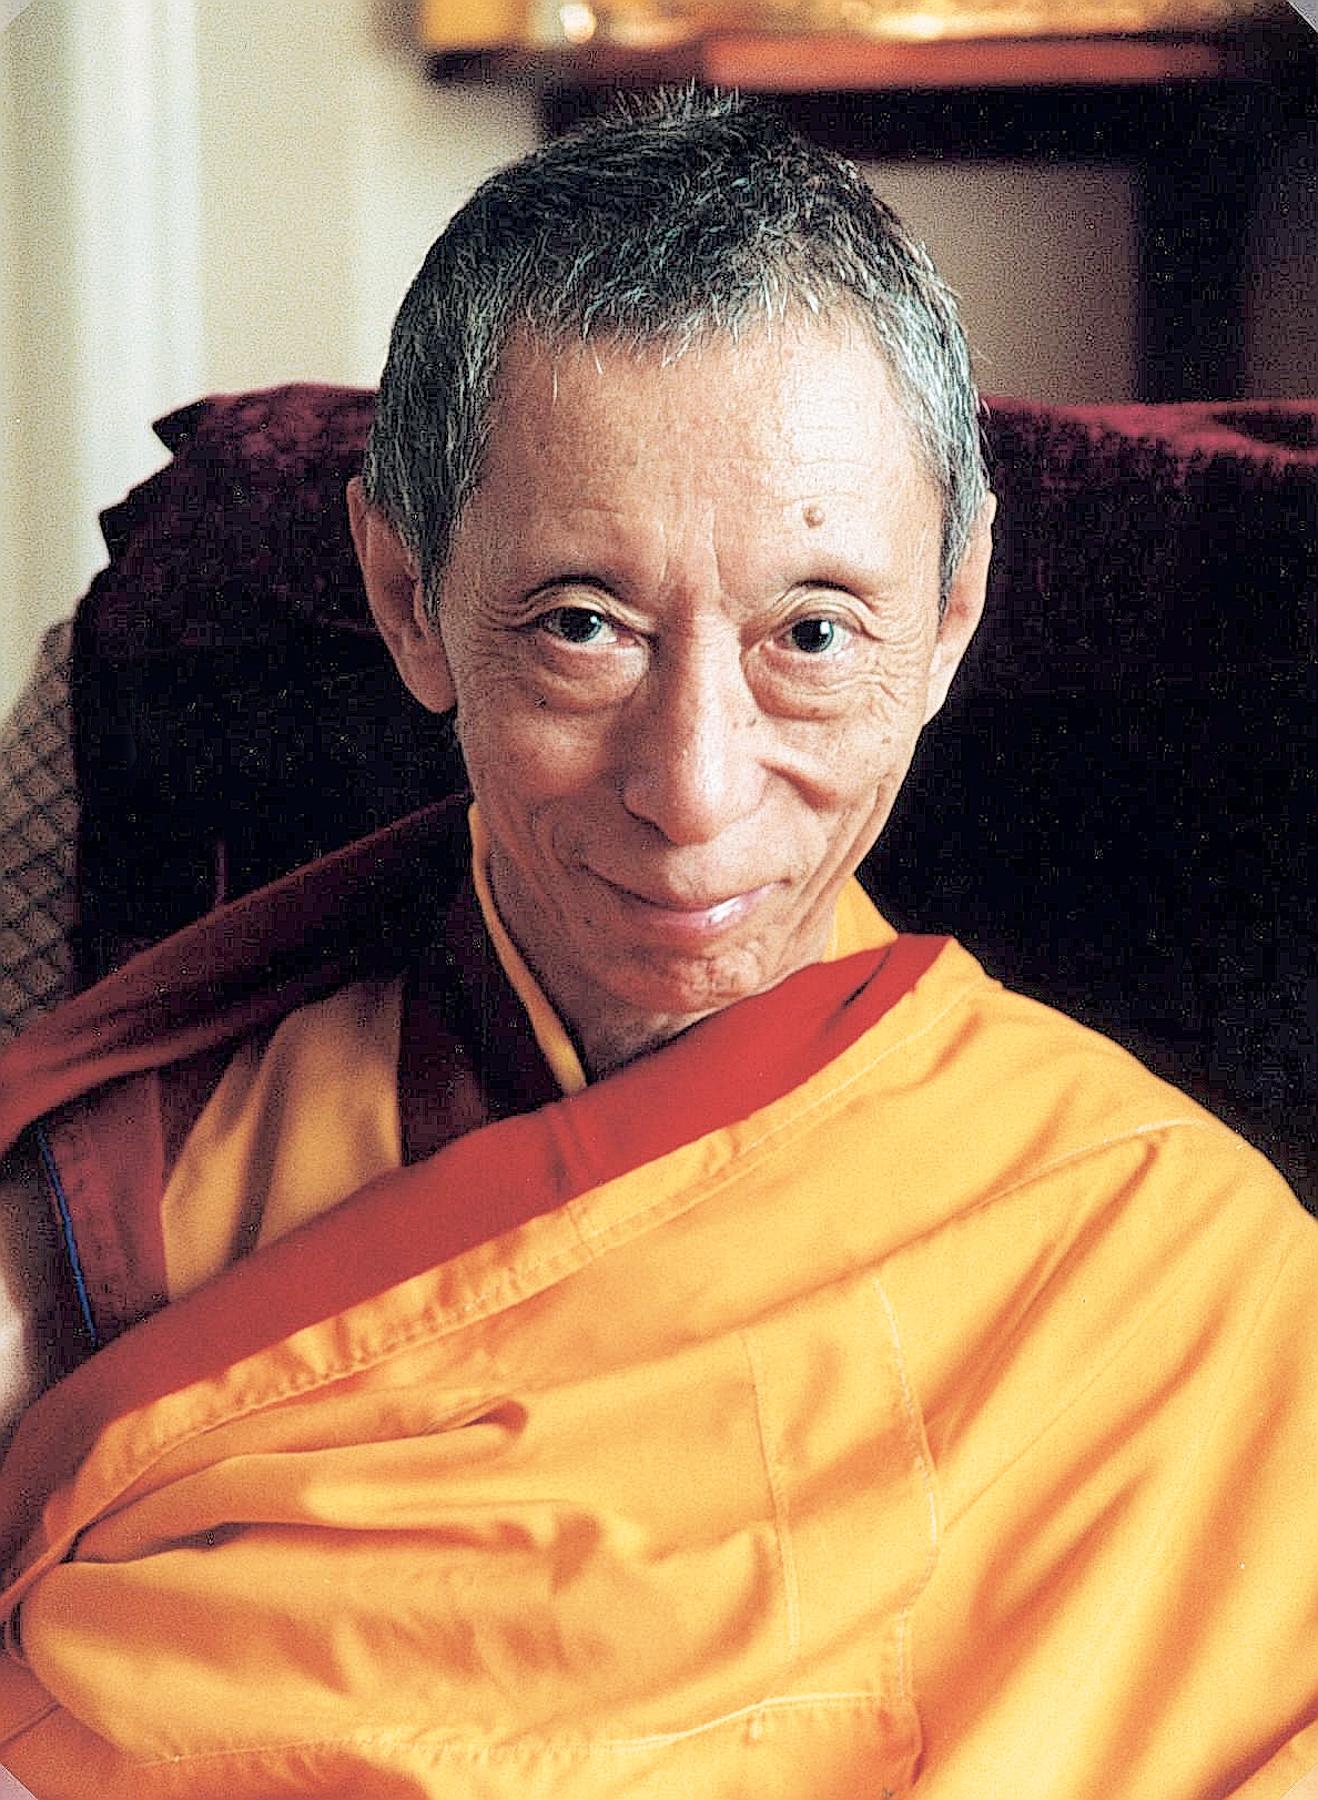 Venerável Geshe Kelsang Gyatso Rinpoche